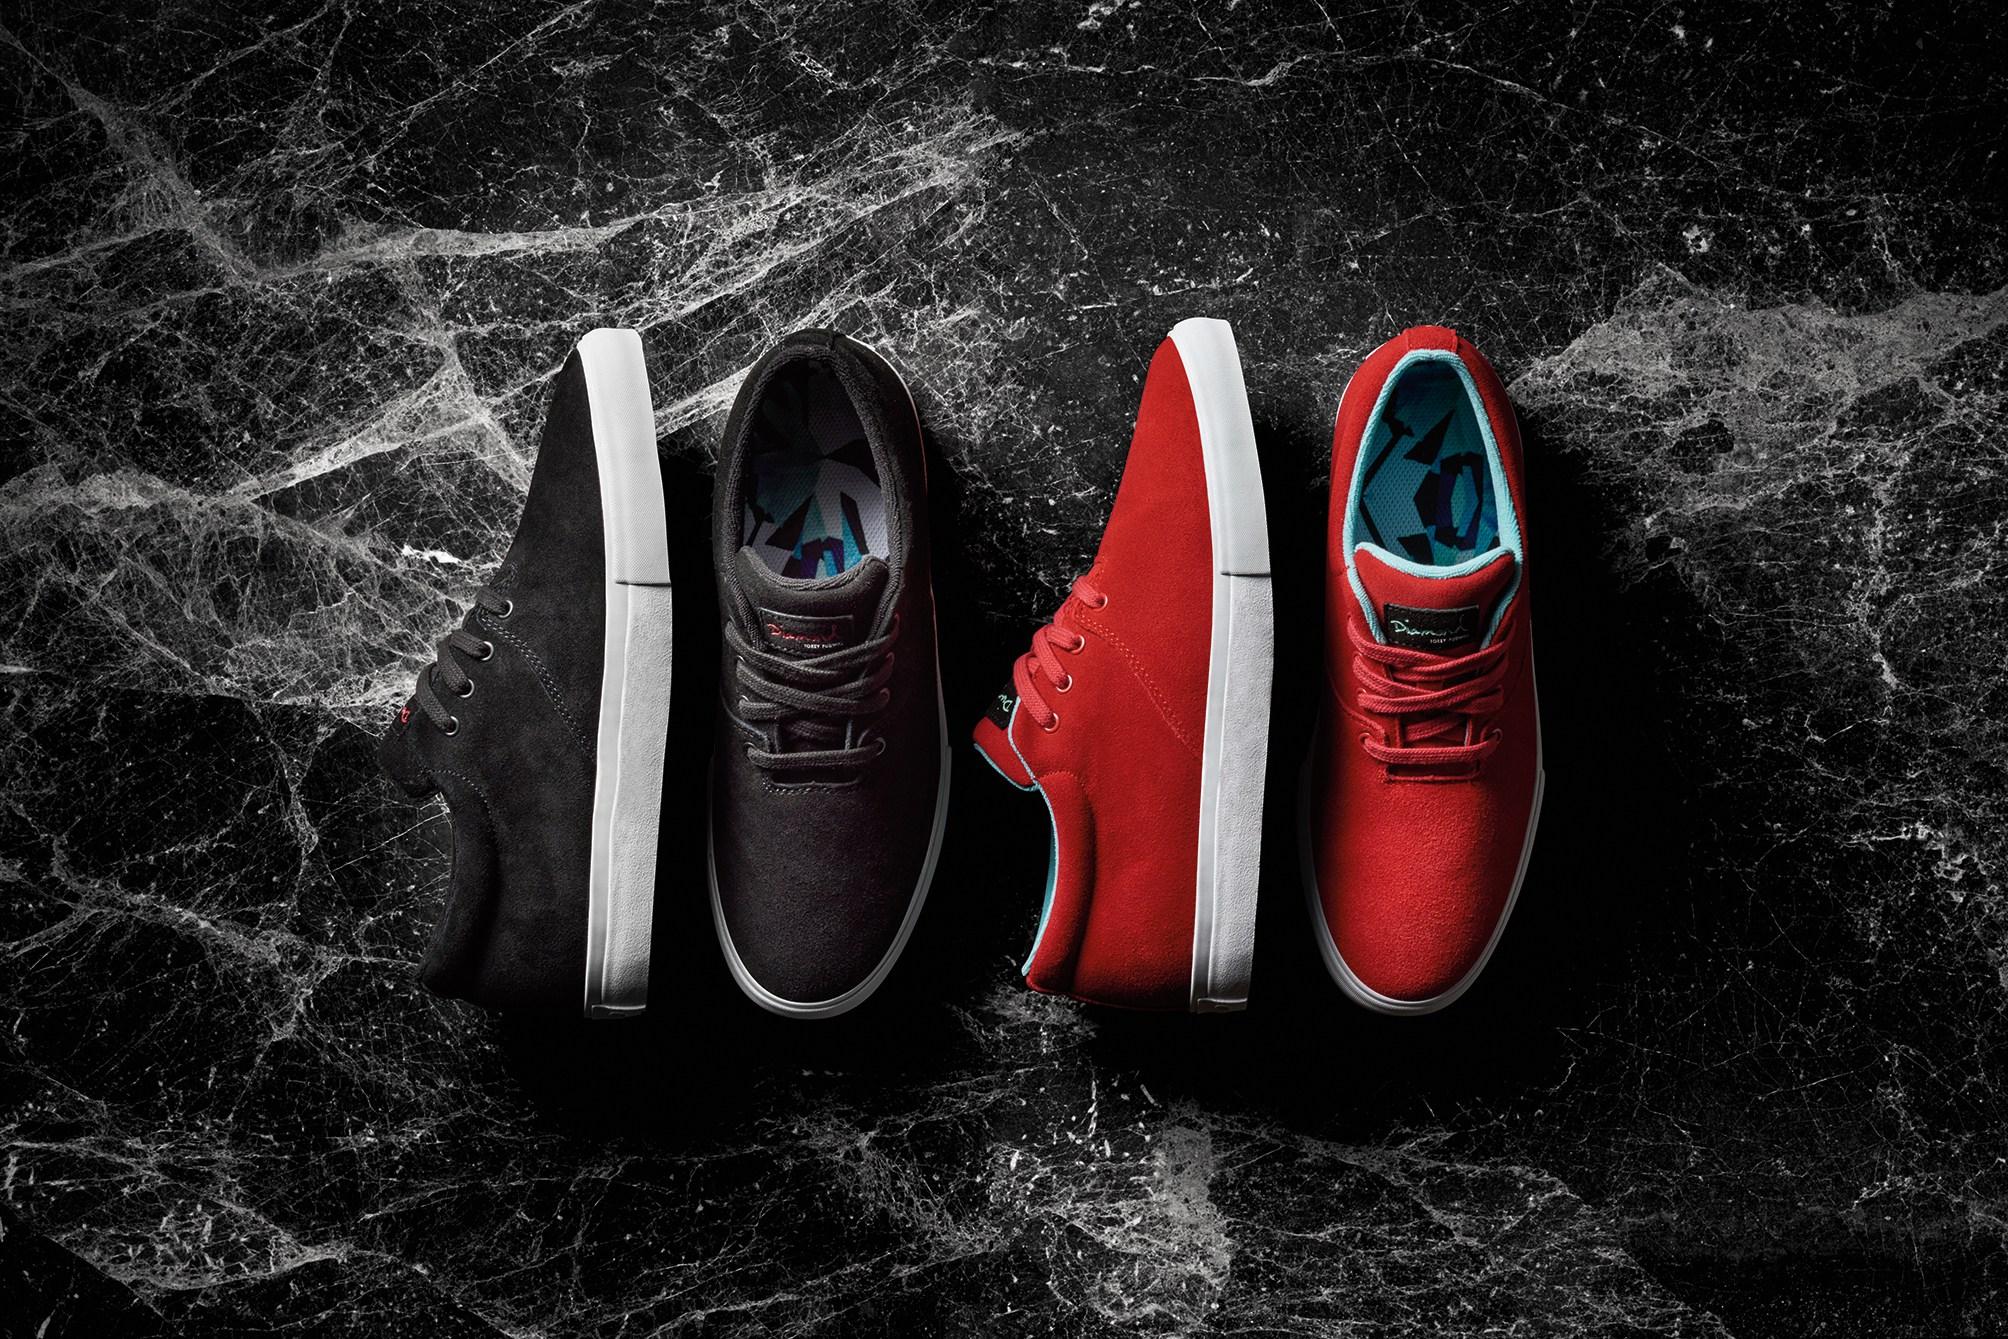 diamond-supply-co-launches-footwear-2.jpg